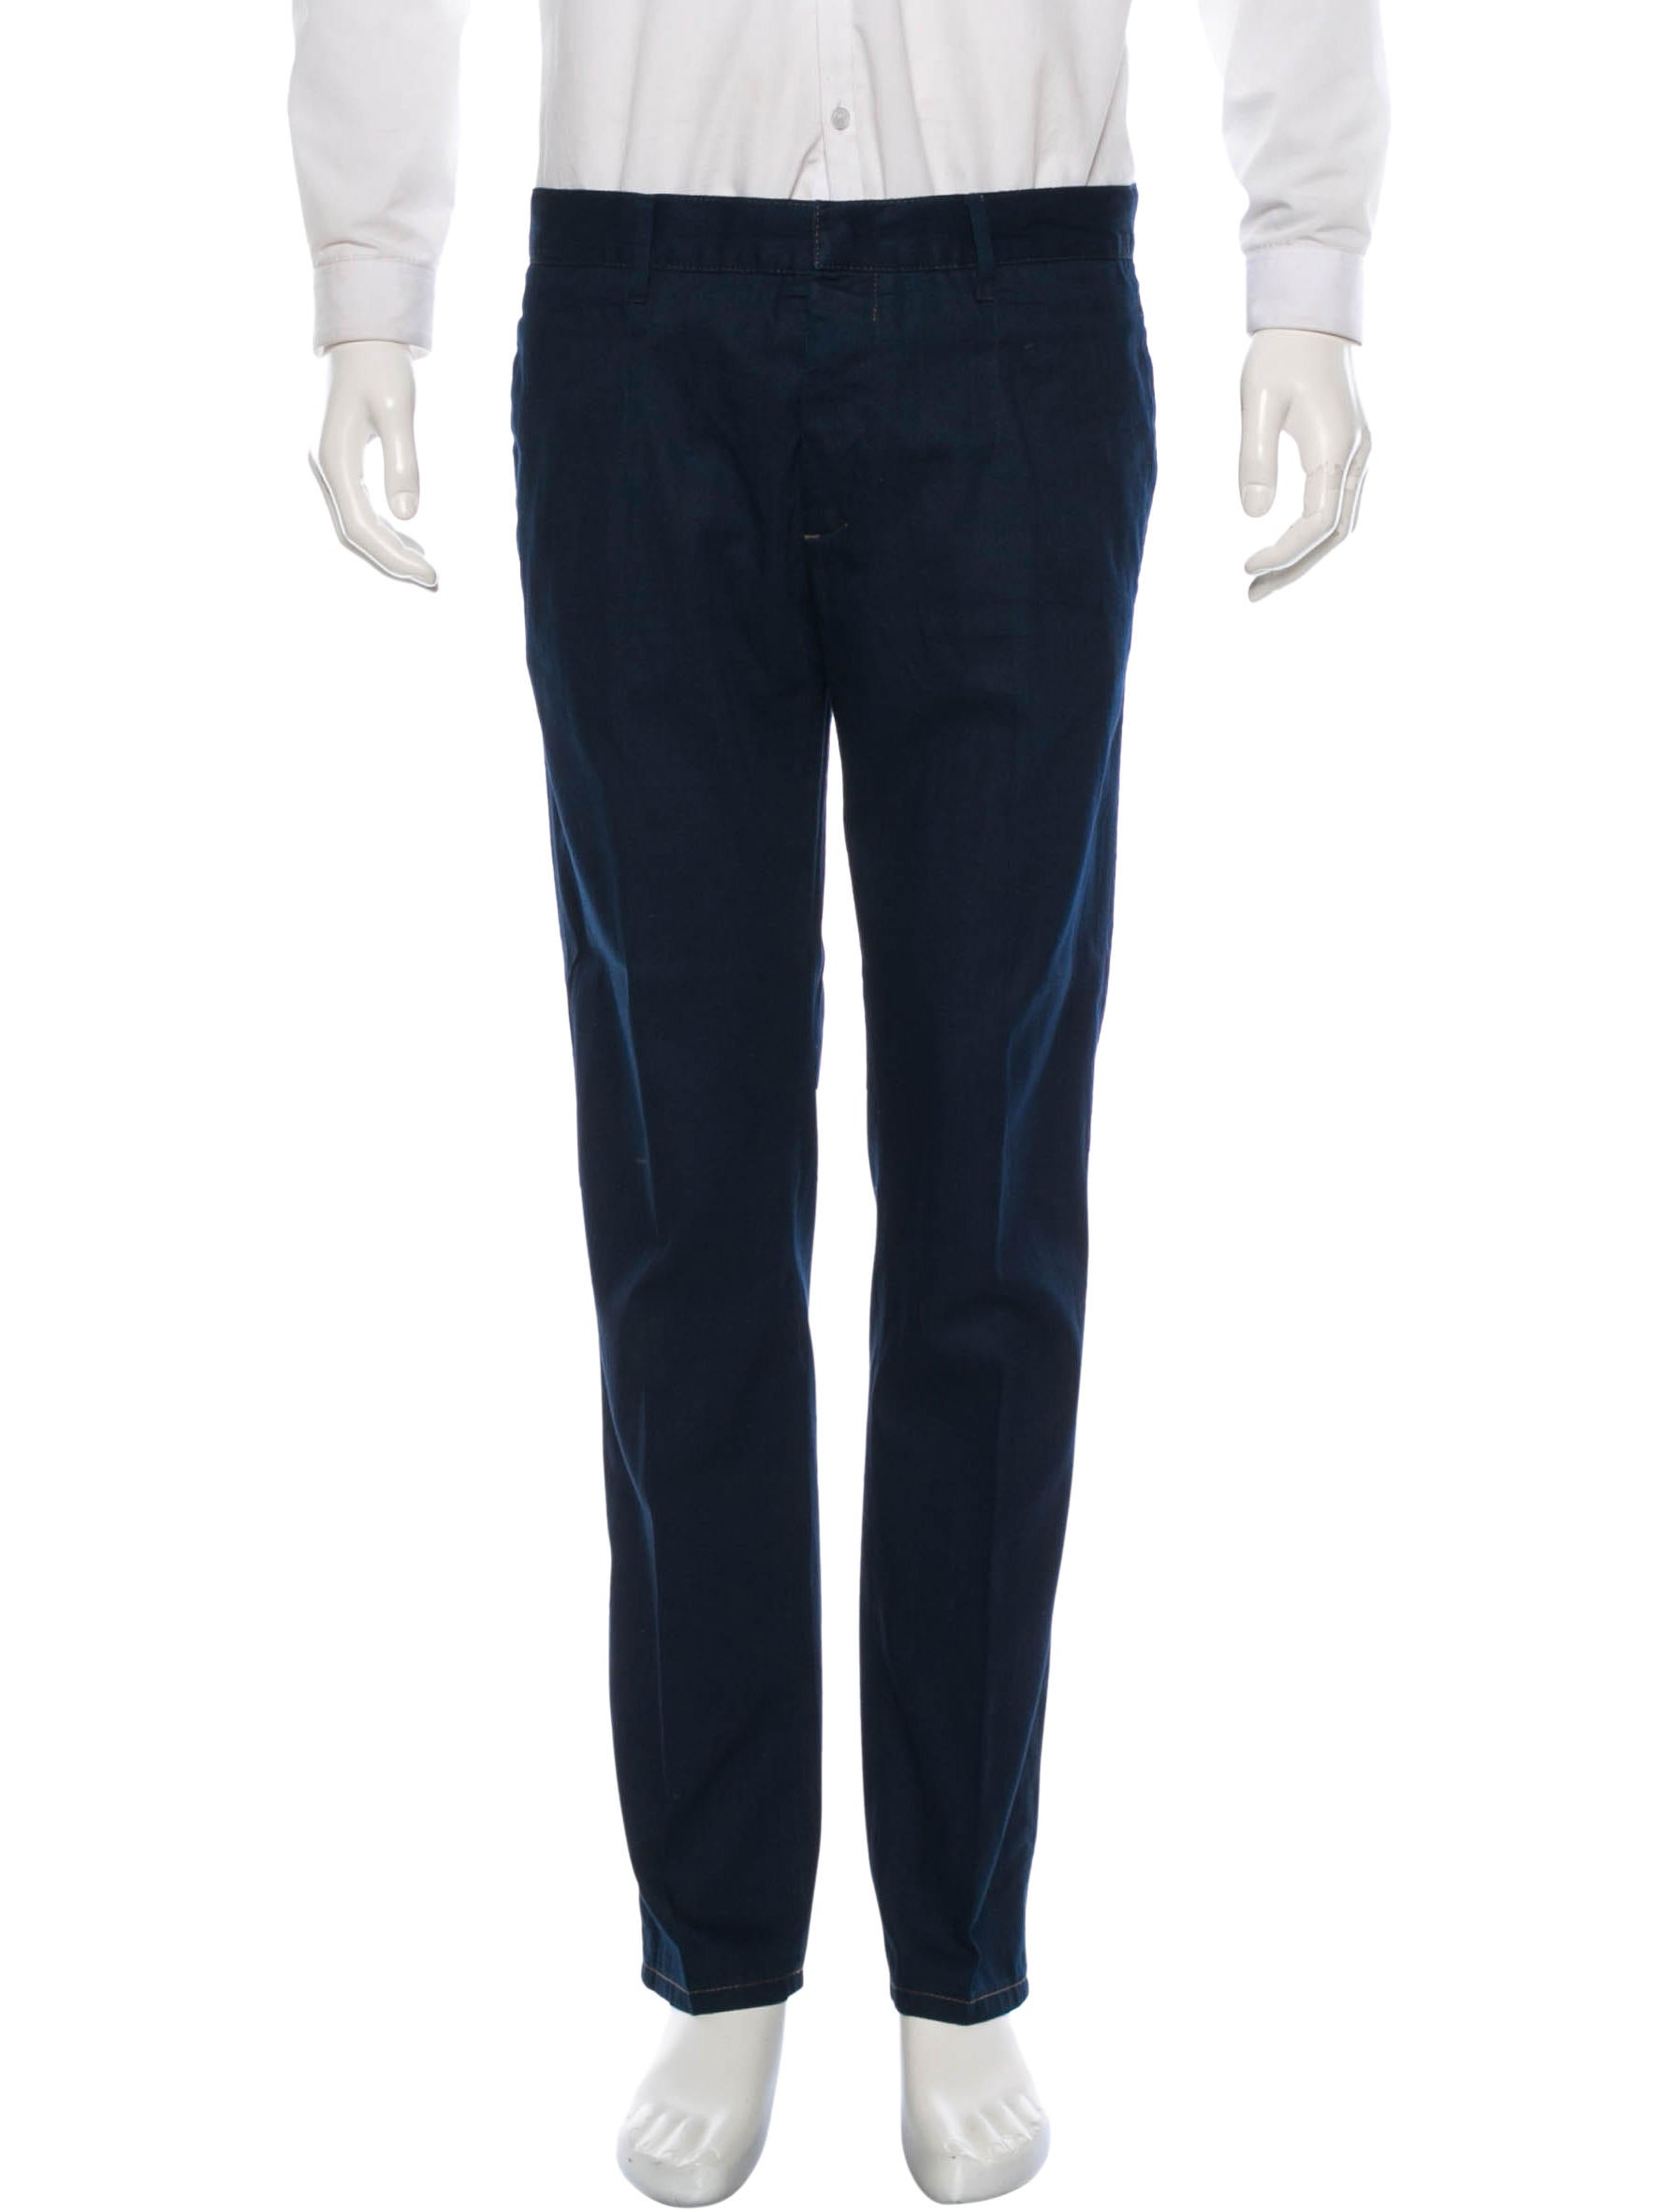 Prada chambray pants clothing pra61103 the realreal for Chambray jeans